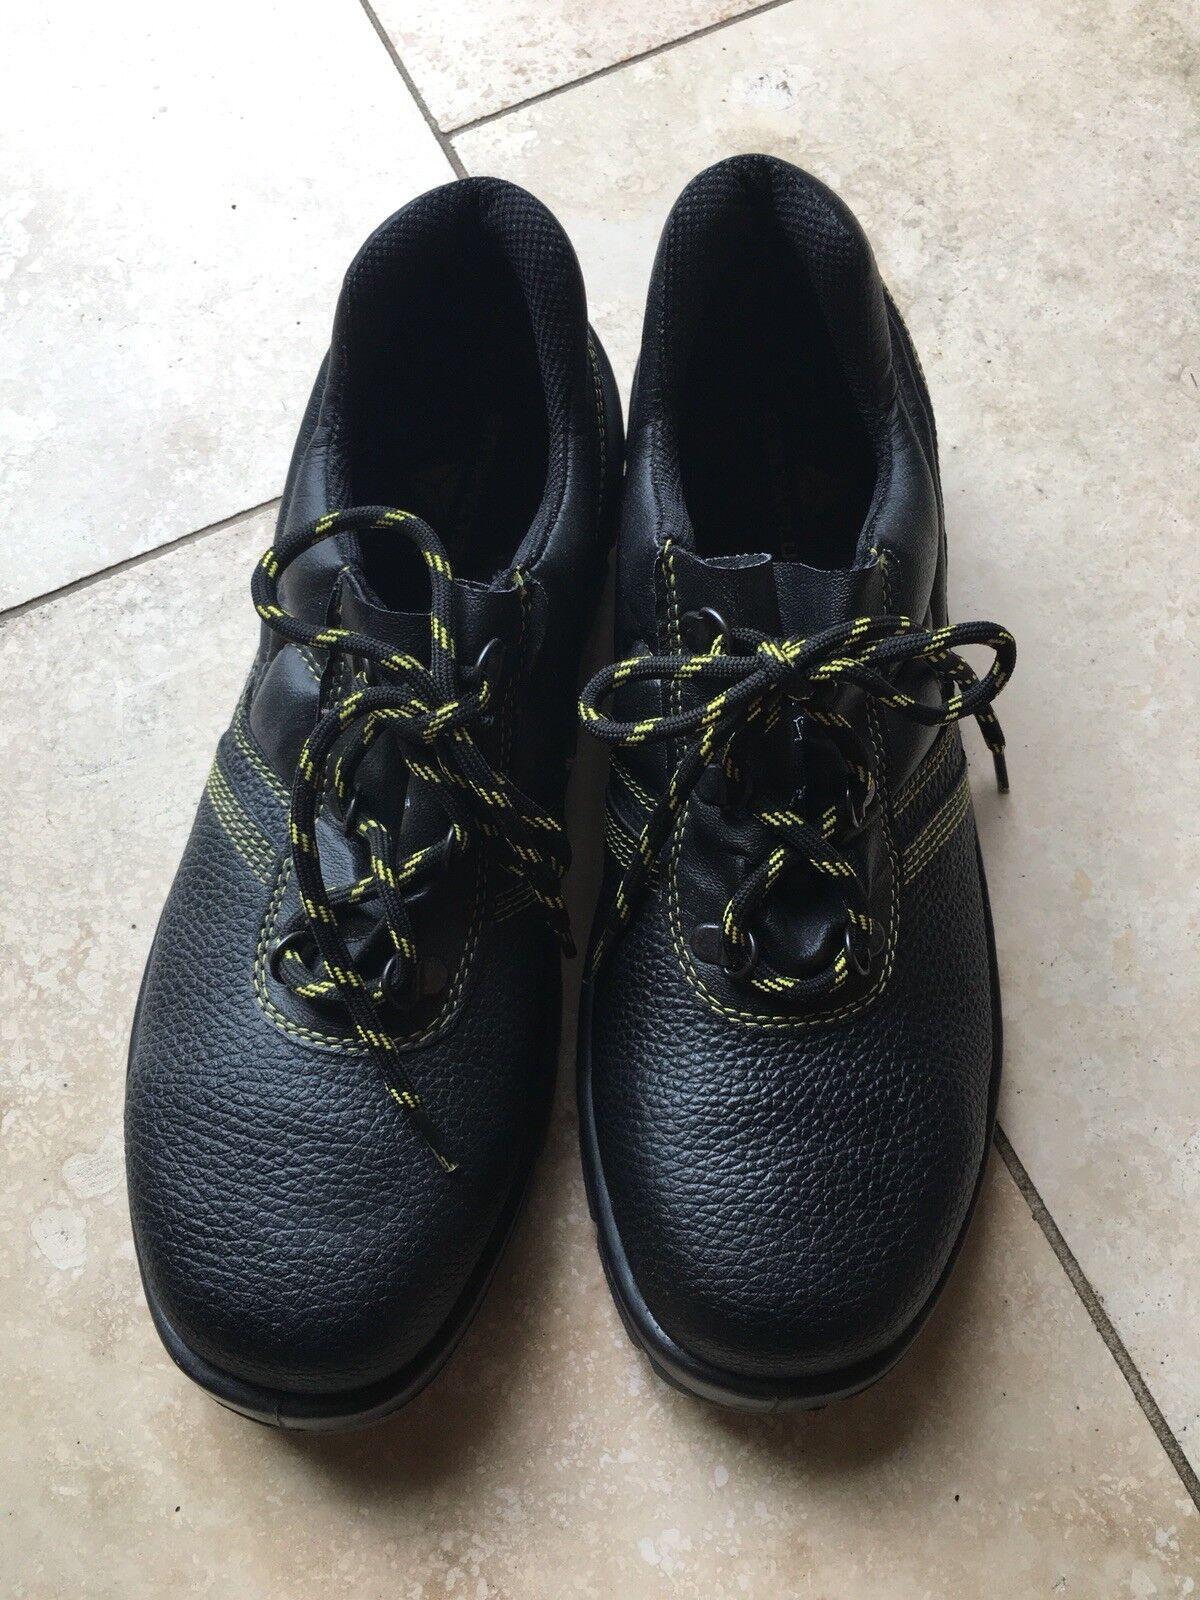 Deltaplus Steel 9 toecap Safety Shoes size 9 Steel 308e44